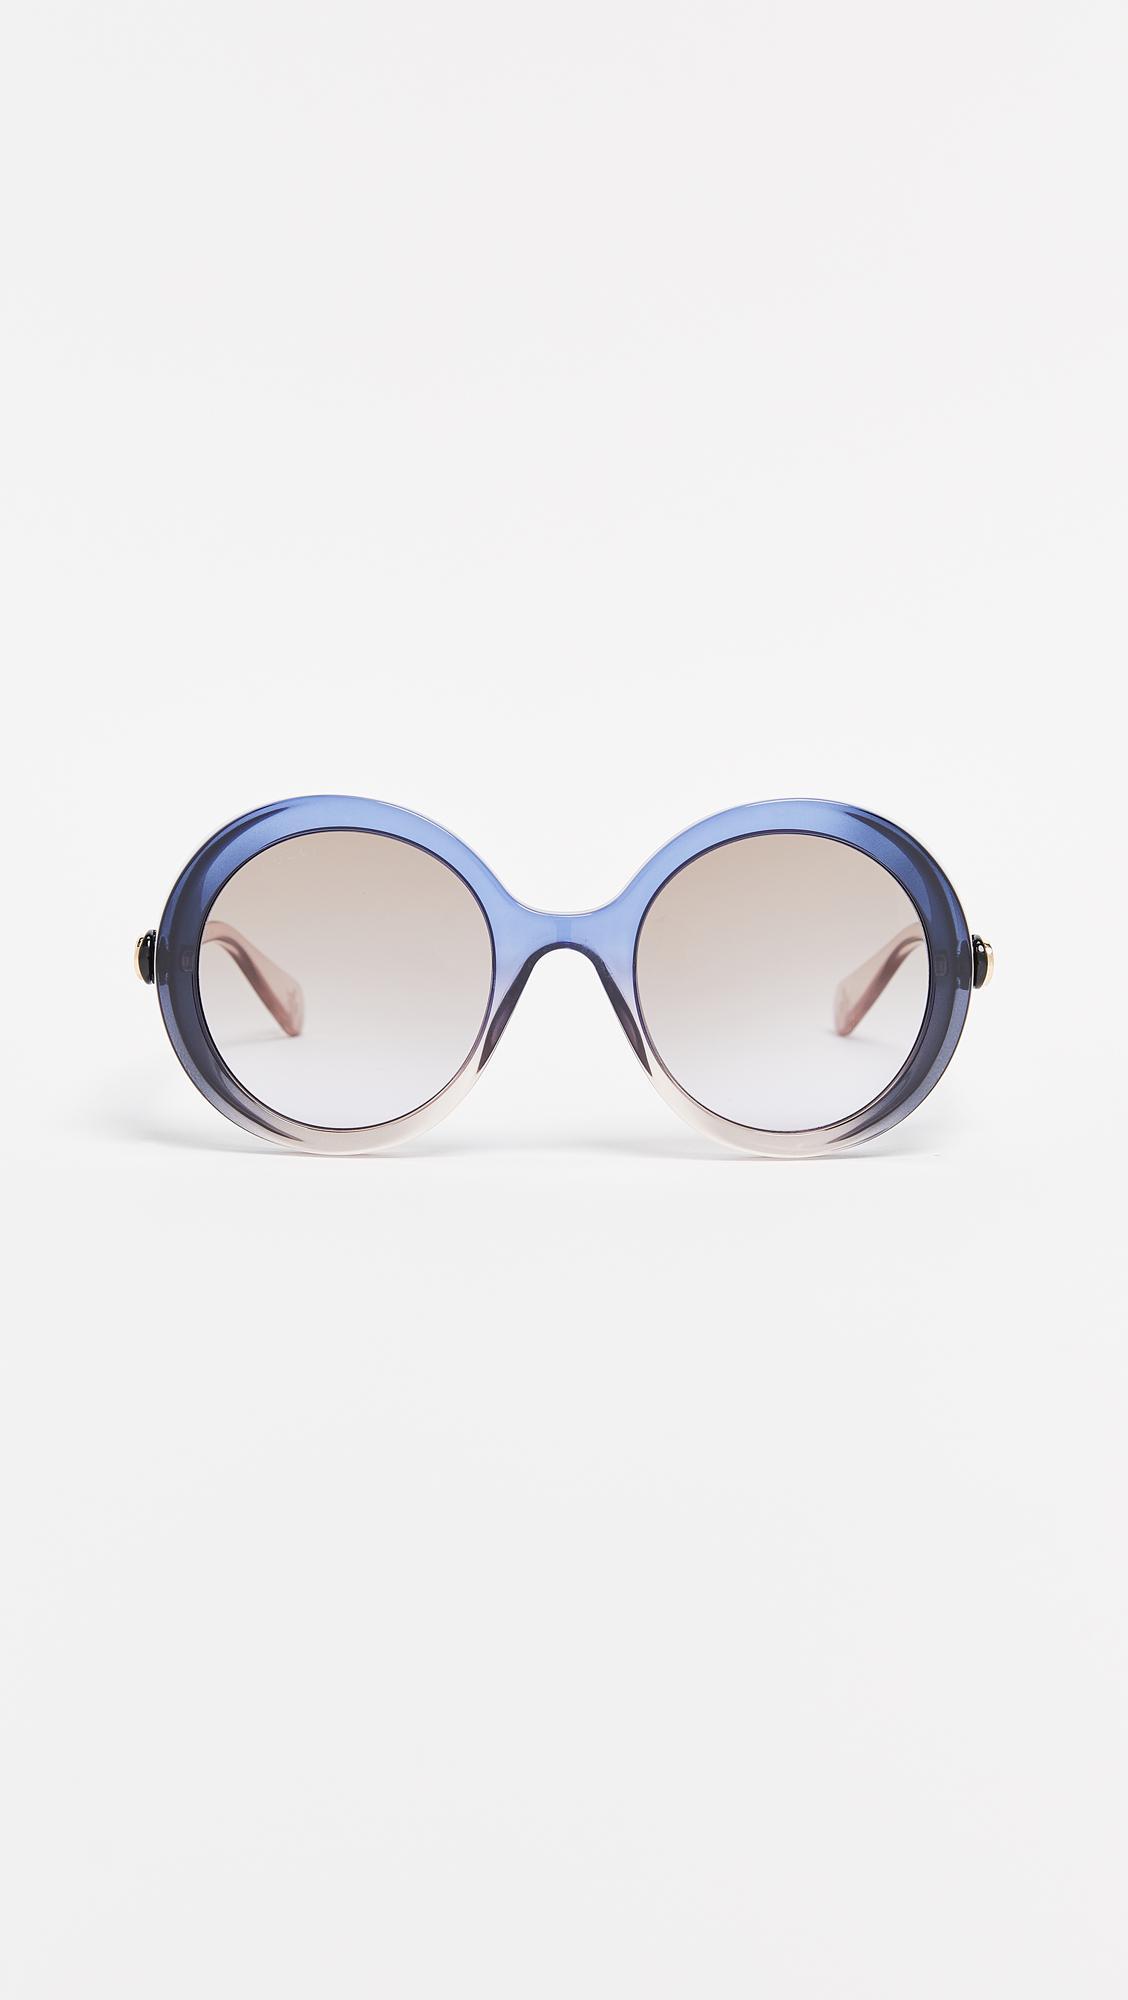 1db6449f192 Lyst - Gucci Glamorous Bold Round Sunglasses in Blue